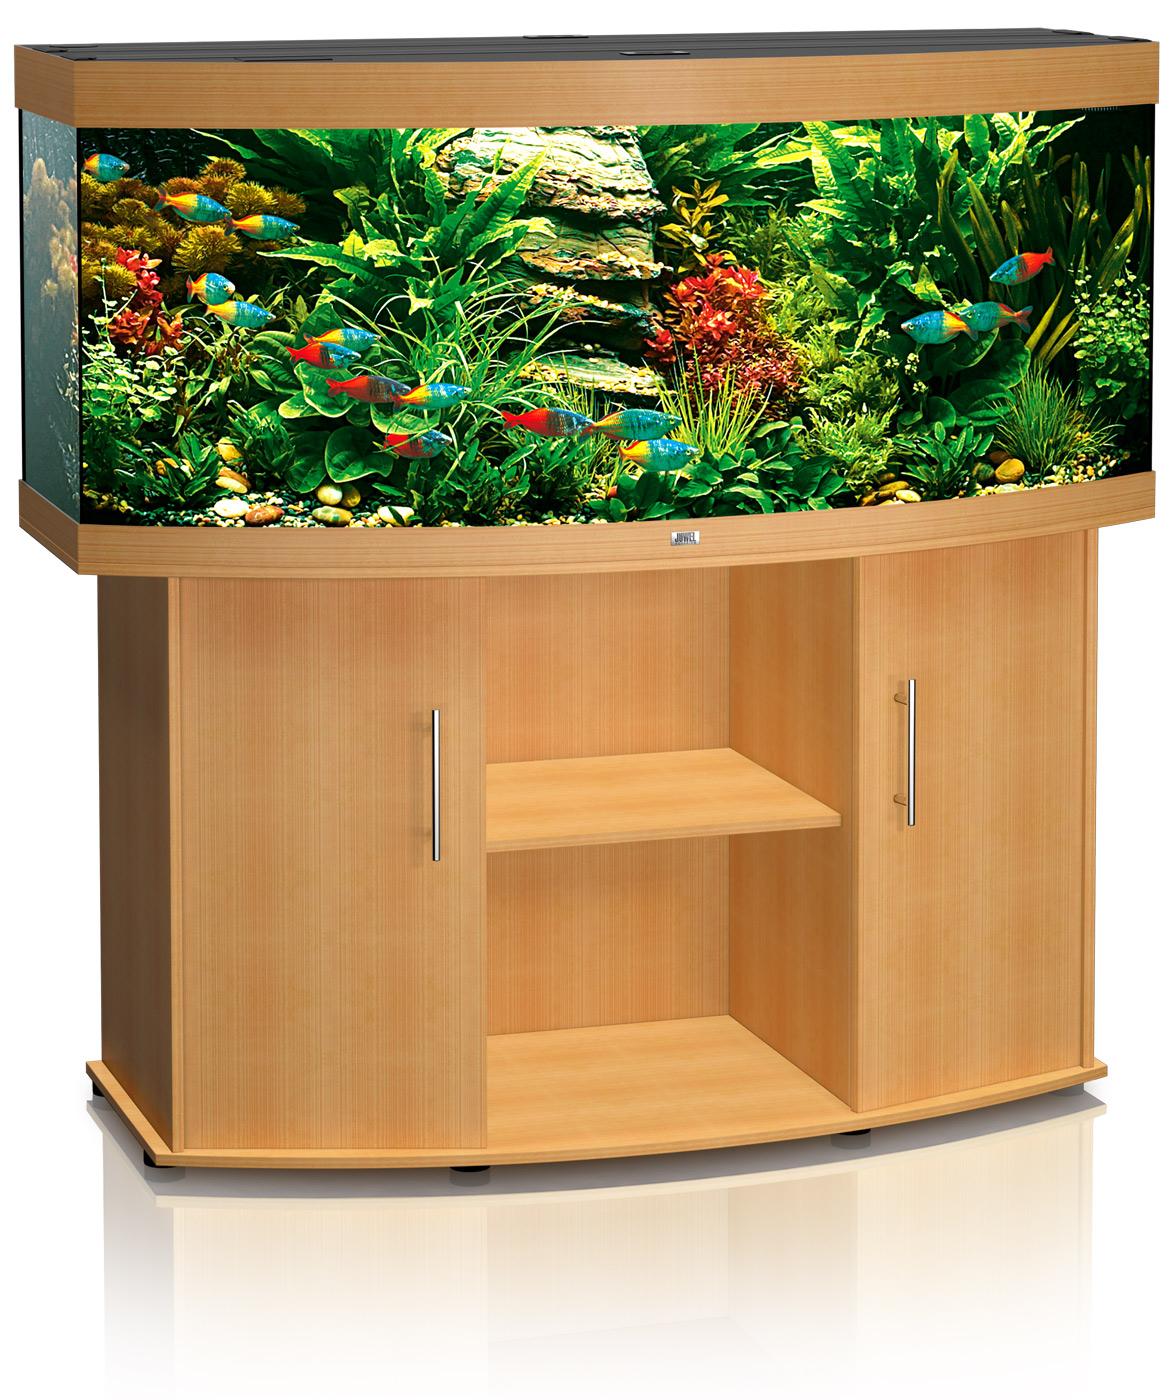 Juwel aquarium fish tank - Vision 450 Beech Juwel Vision 450 Aquarium